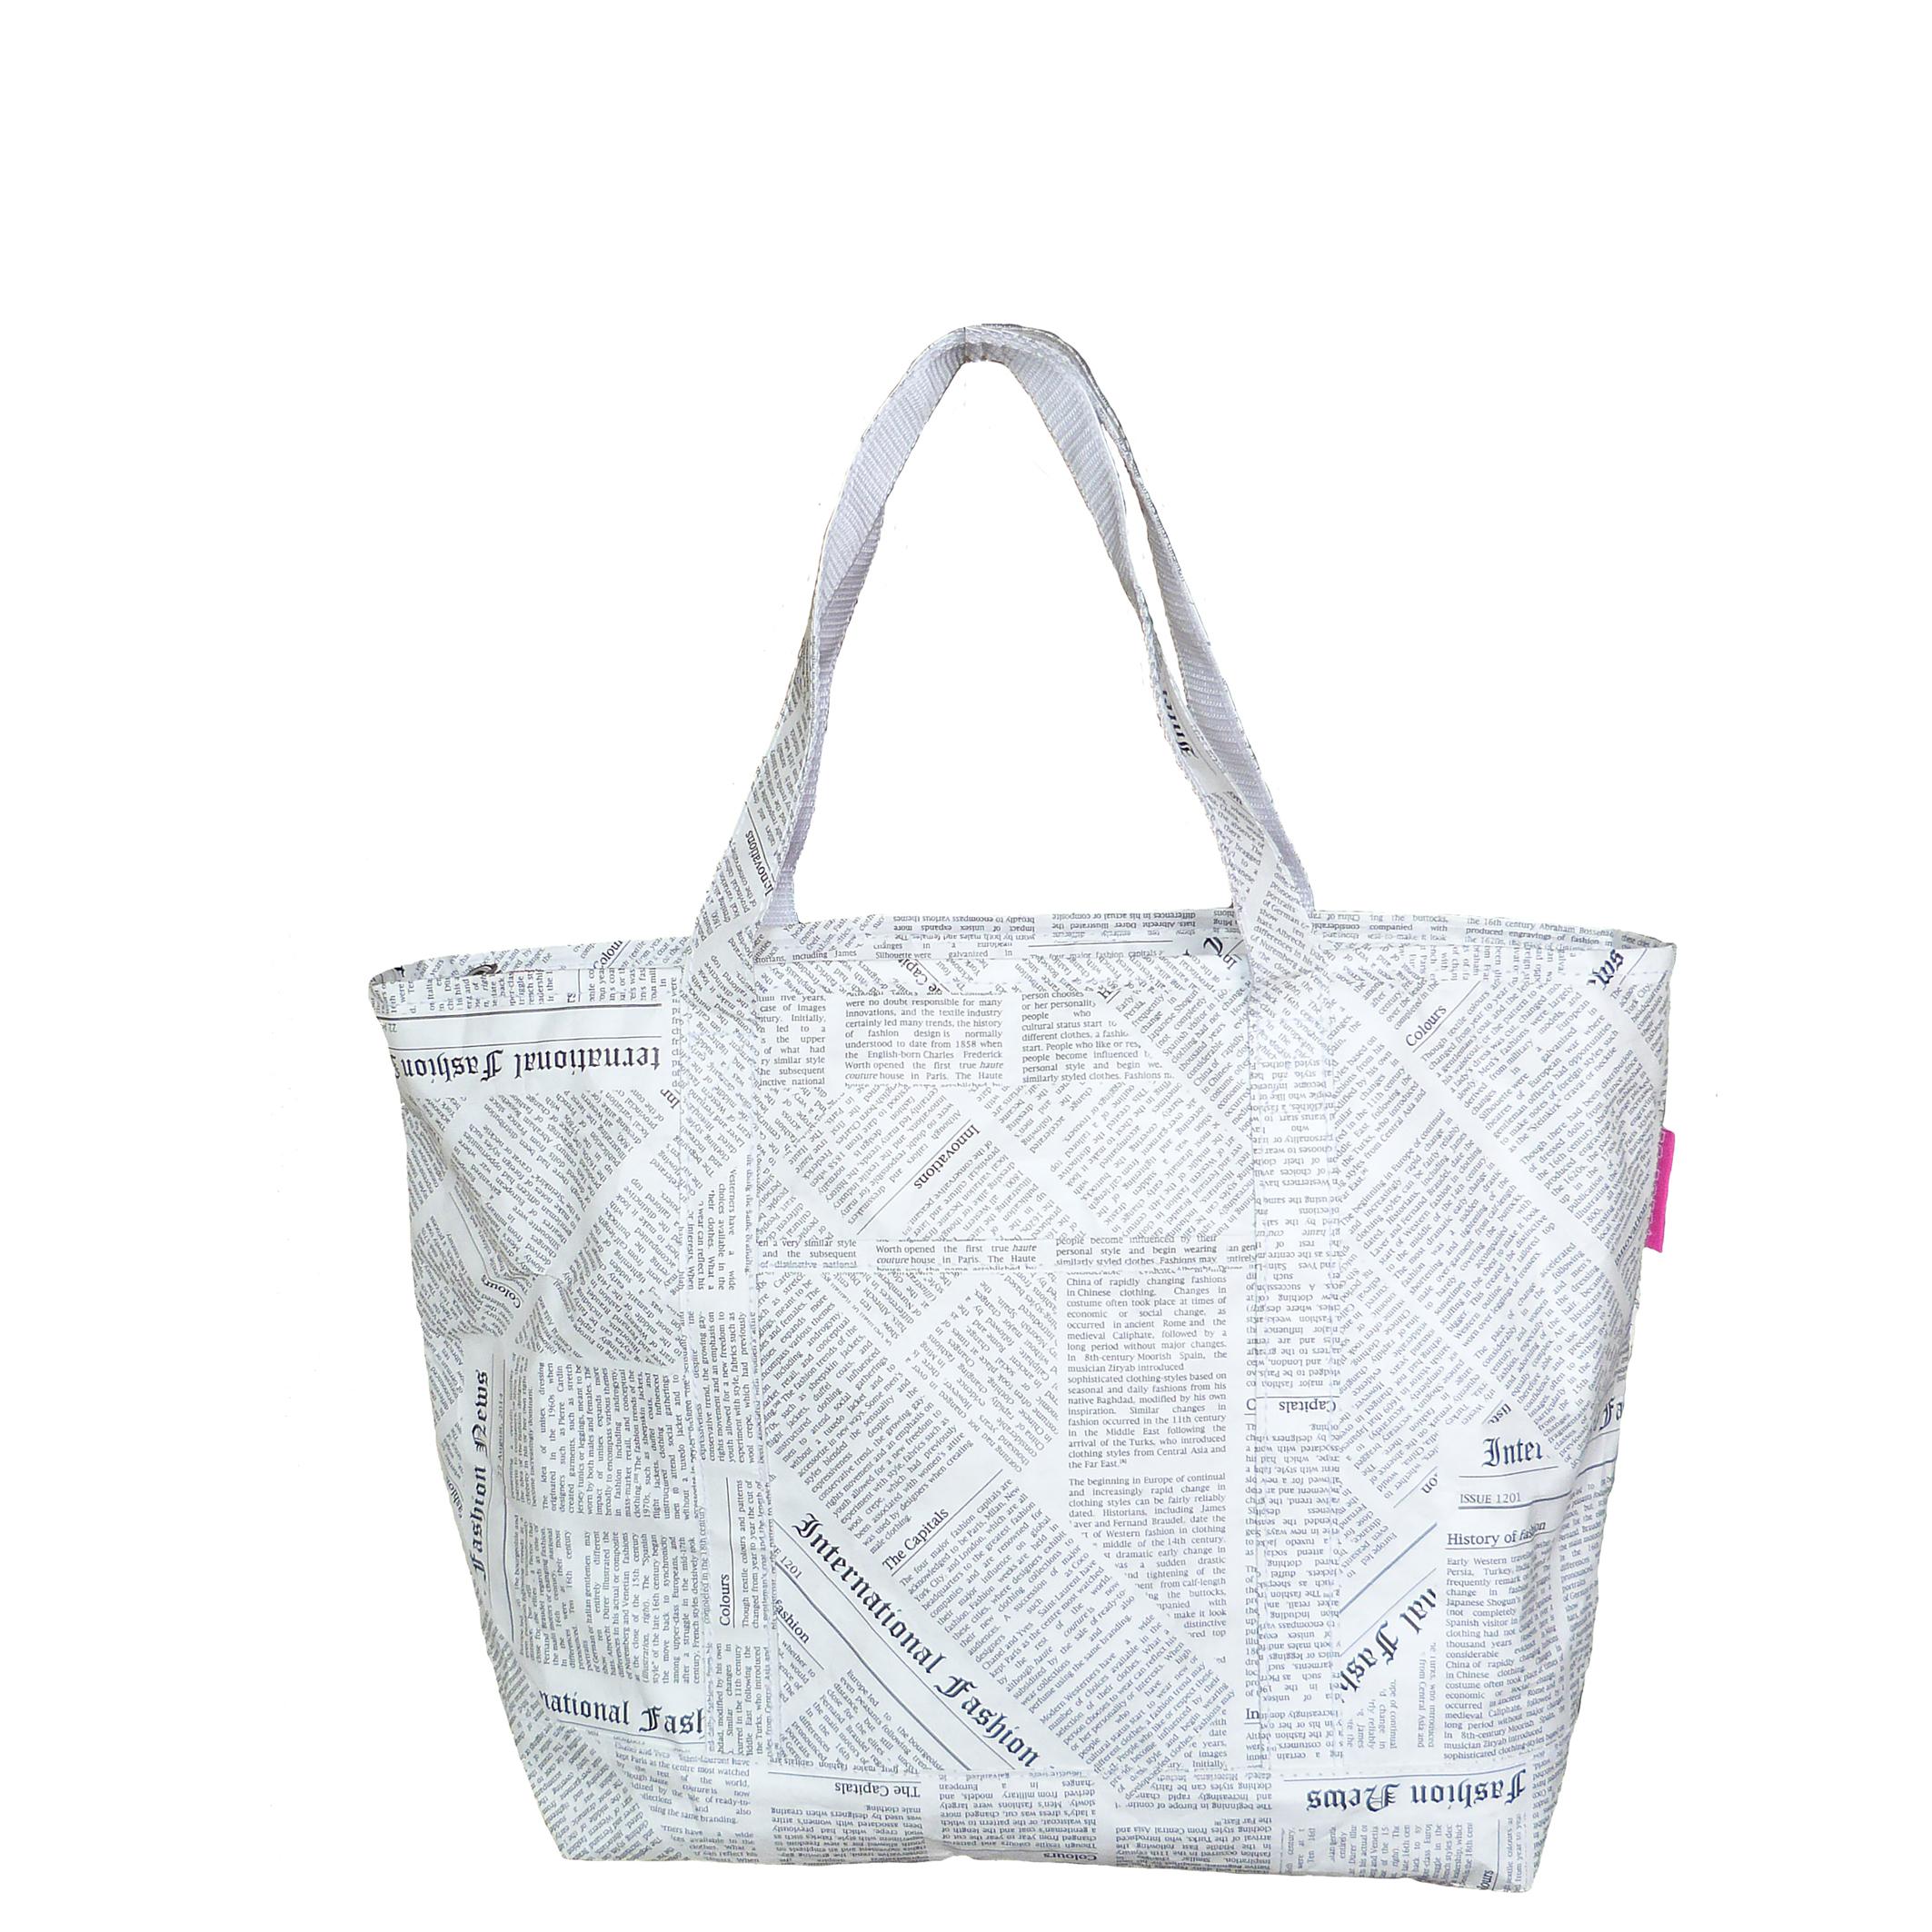 Tyvek lightweight tote bag with newspaper print design